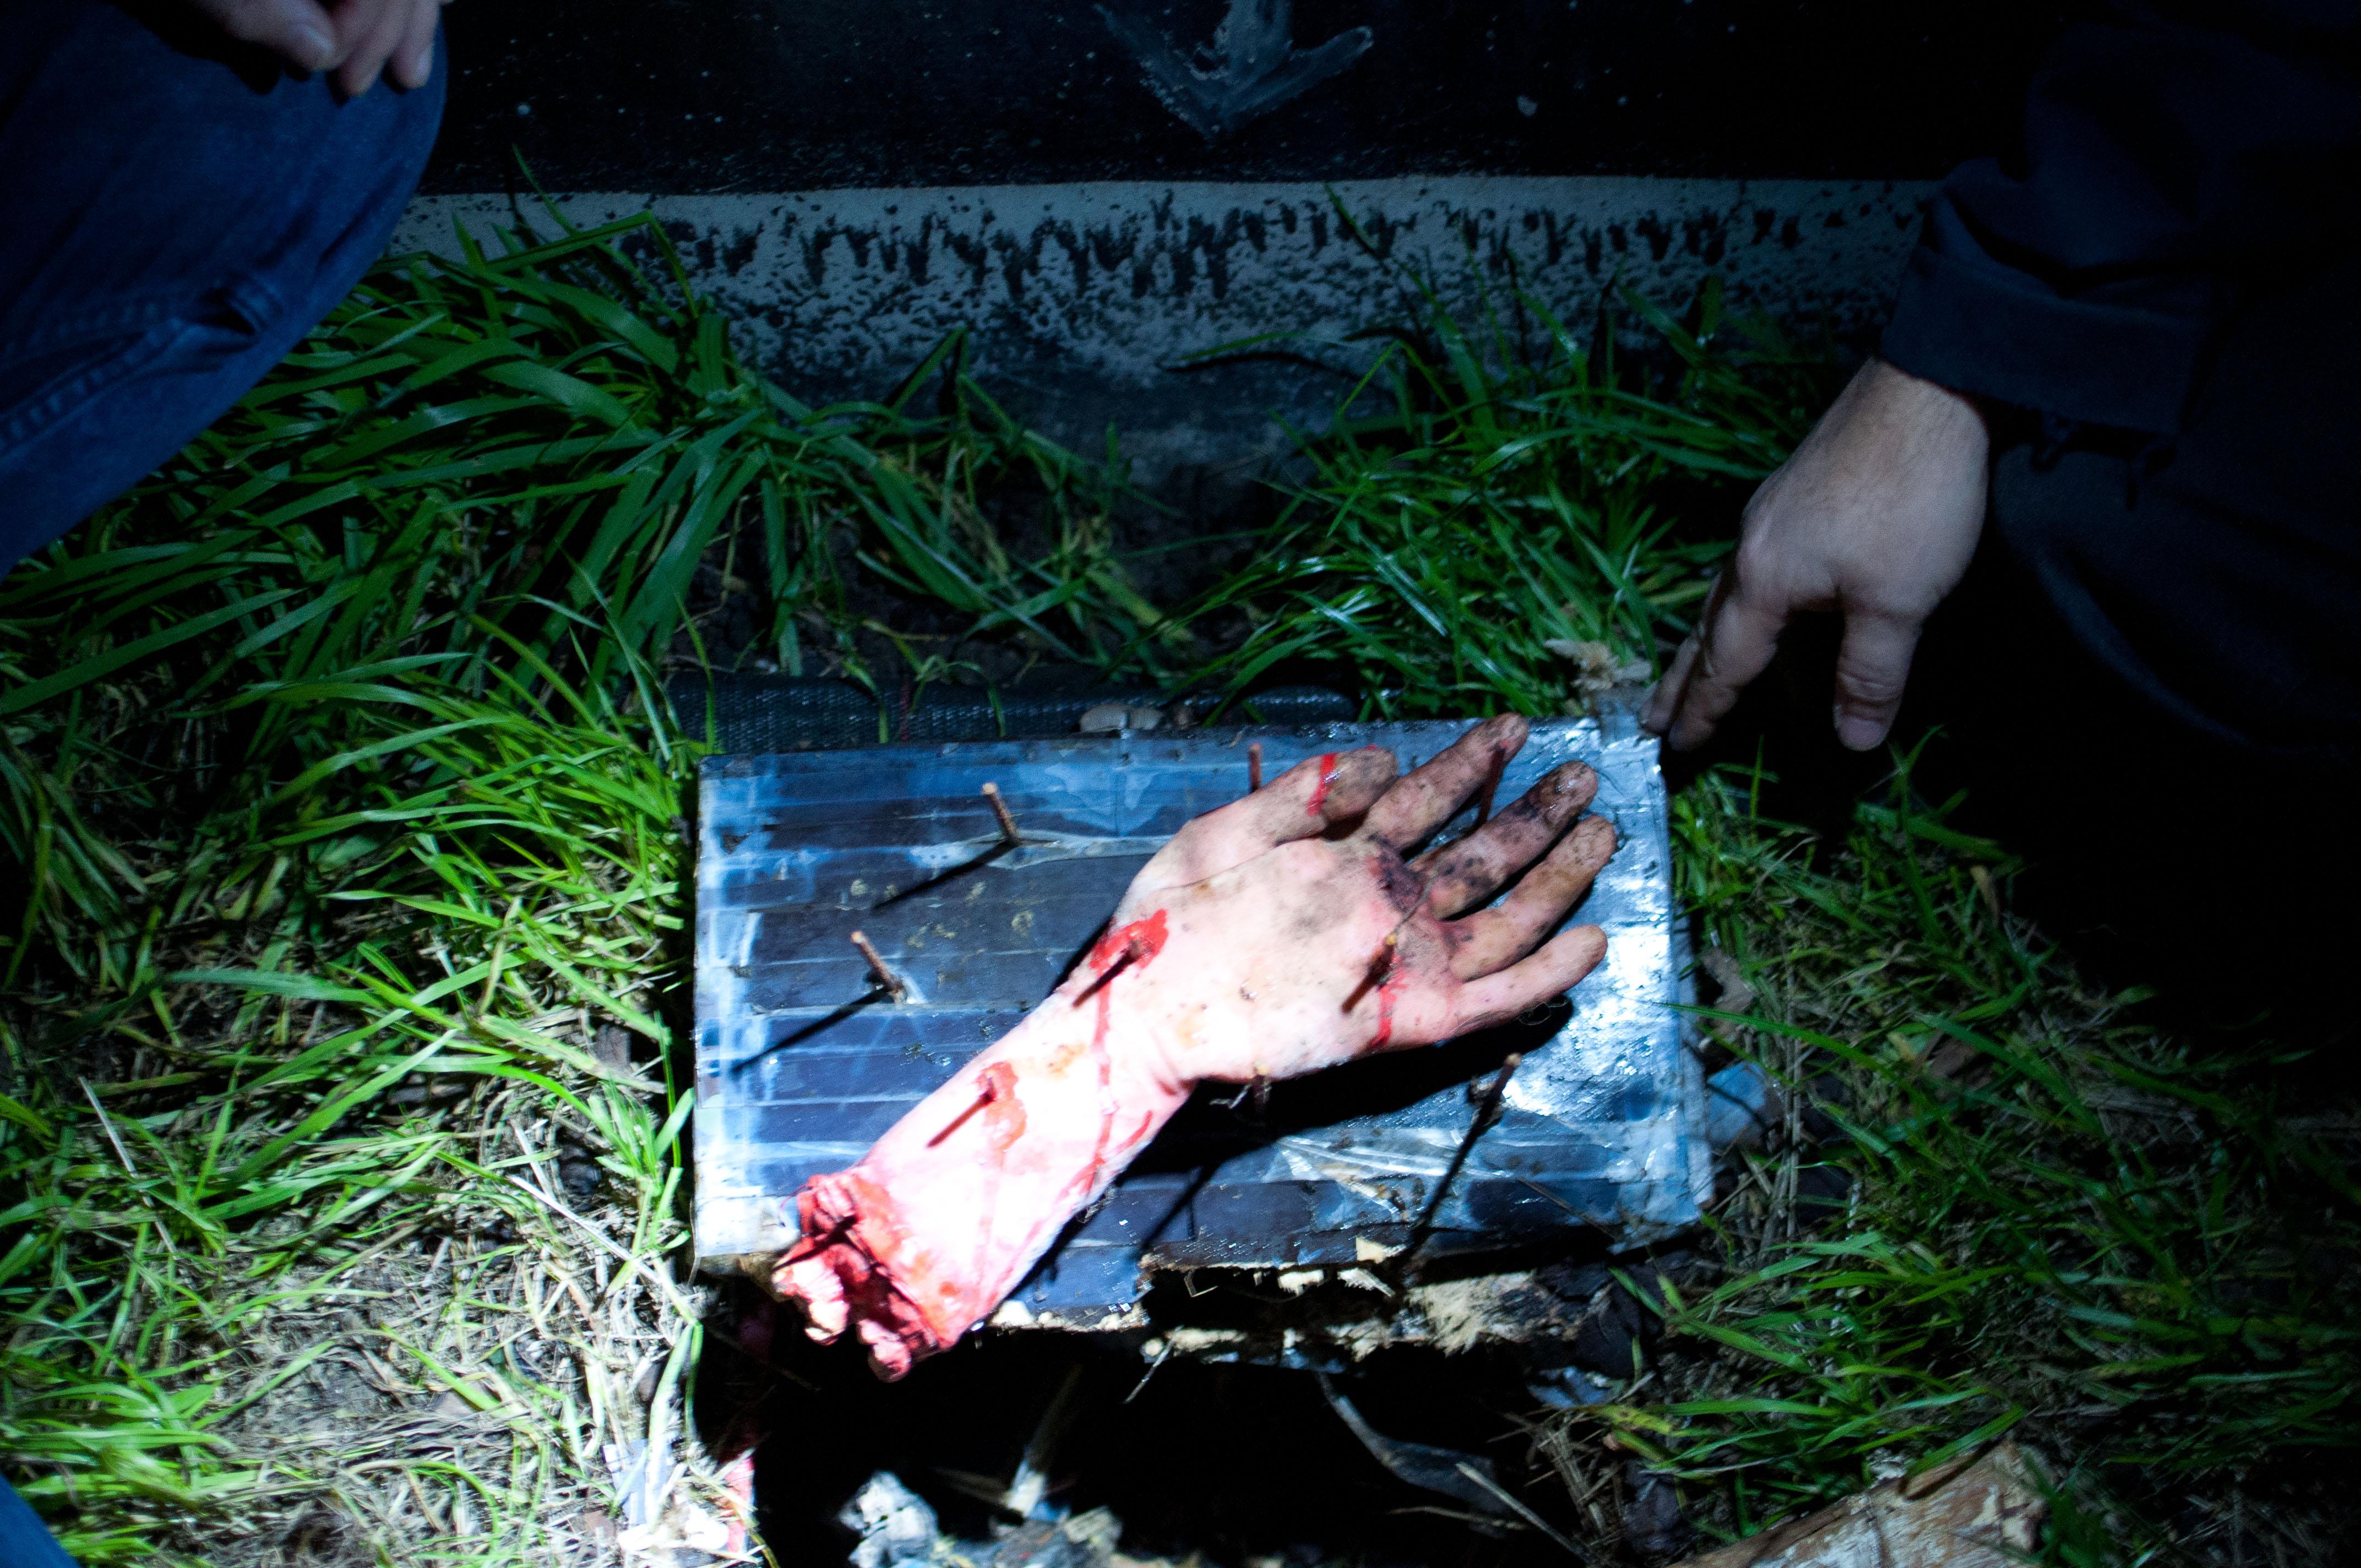 Fright Night - Nachtcaches gruwen en griezelen